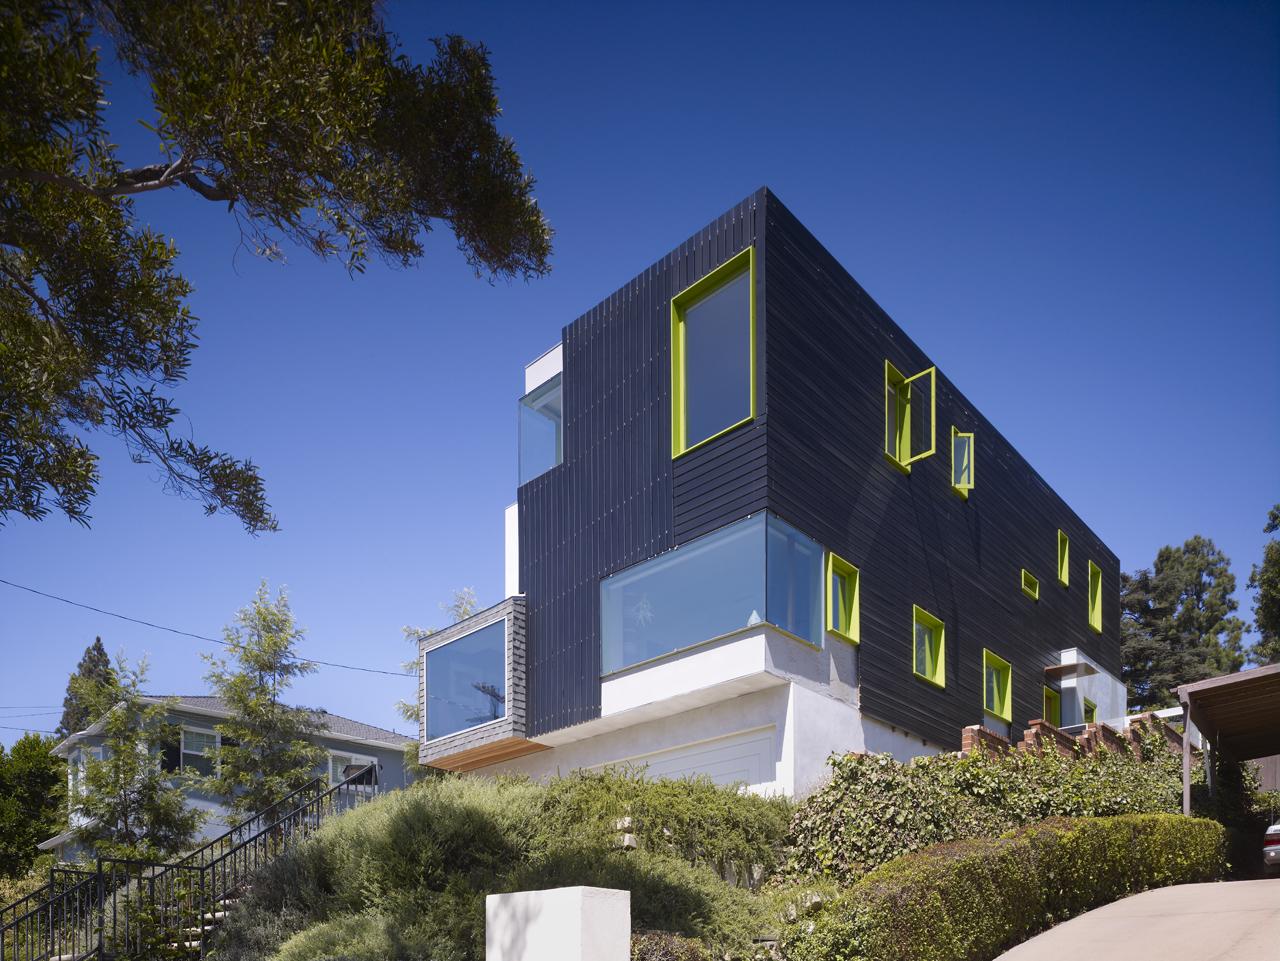 Los Feliz Residence / Warren Techentin Architecture, © Eric Staudenmeier